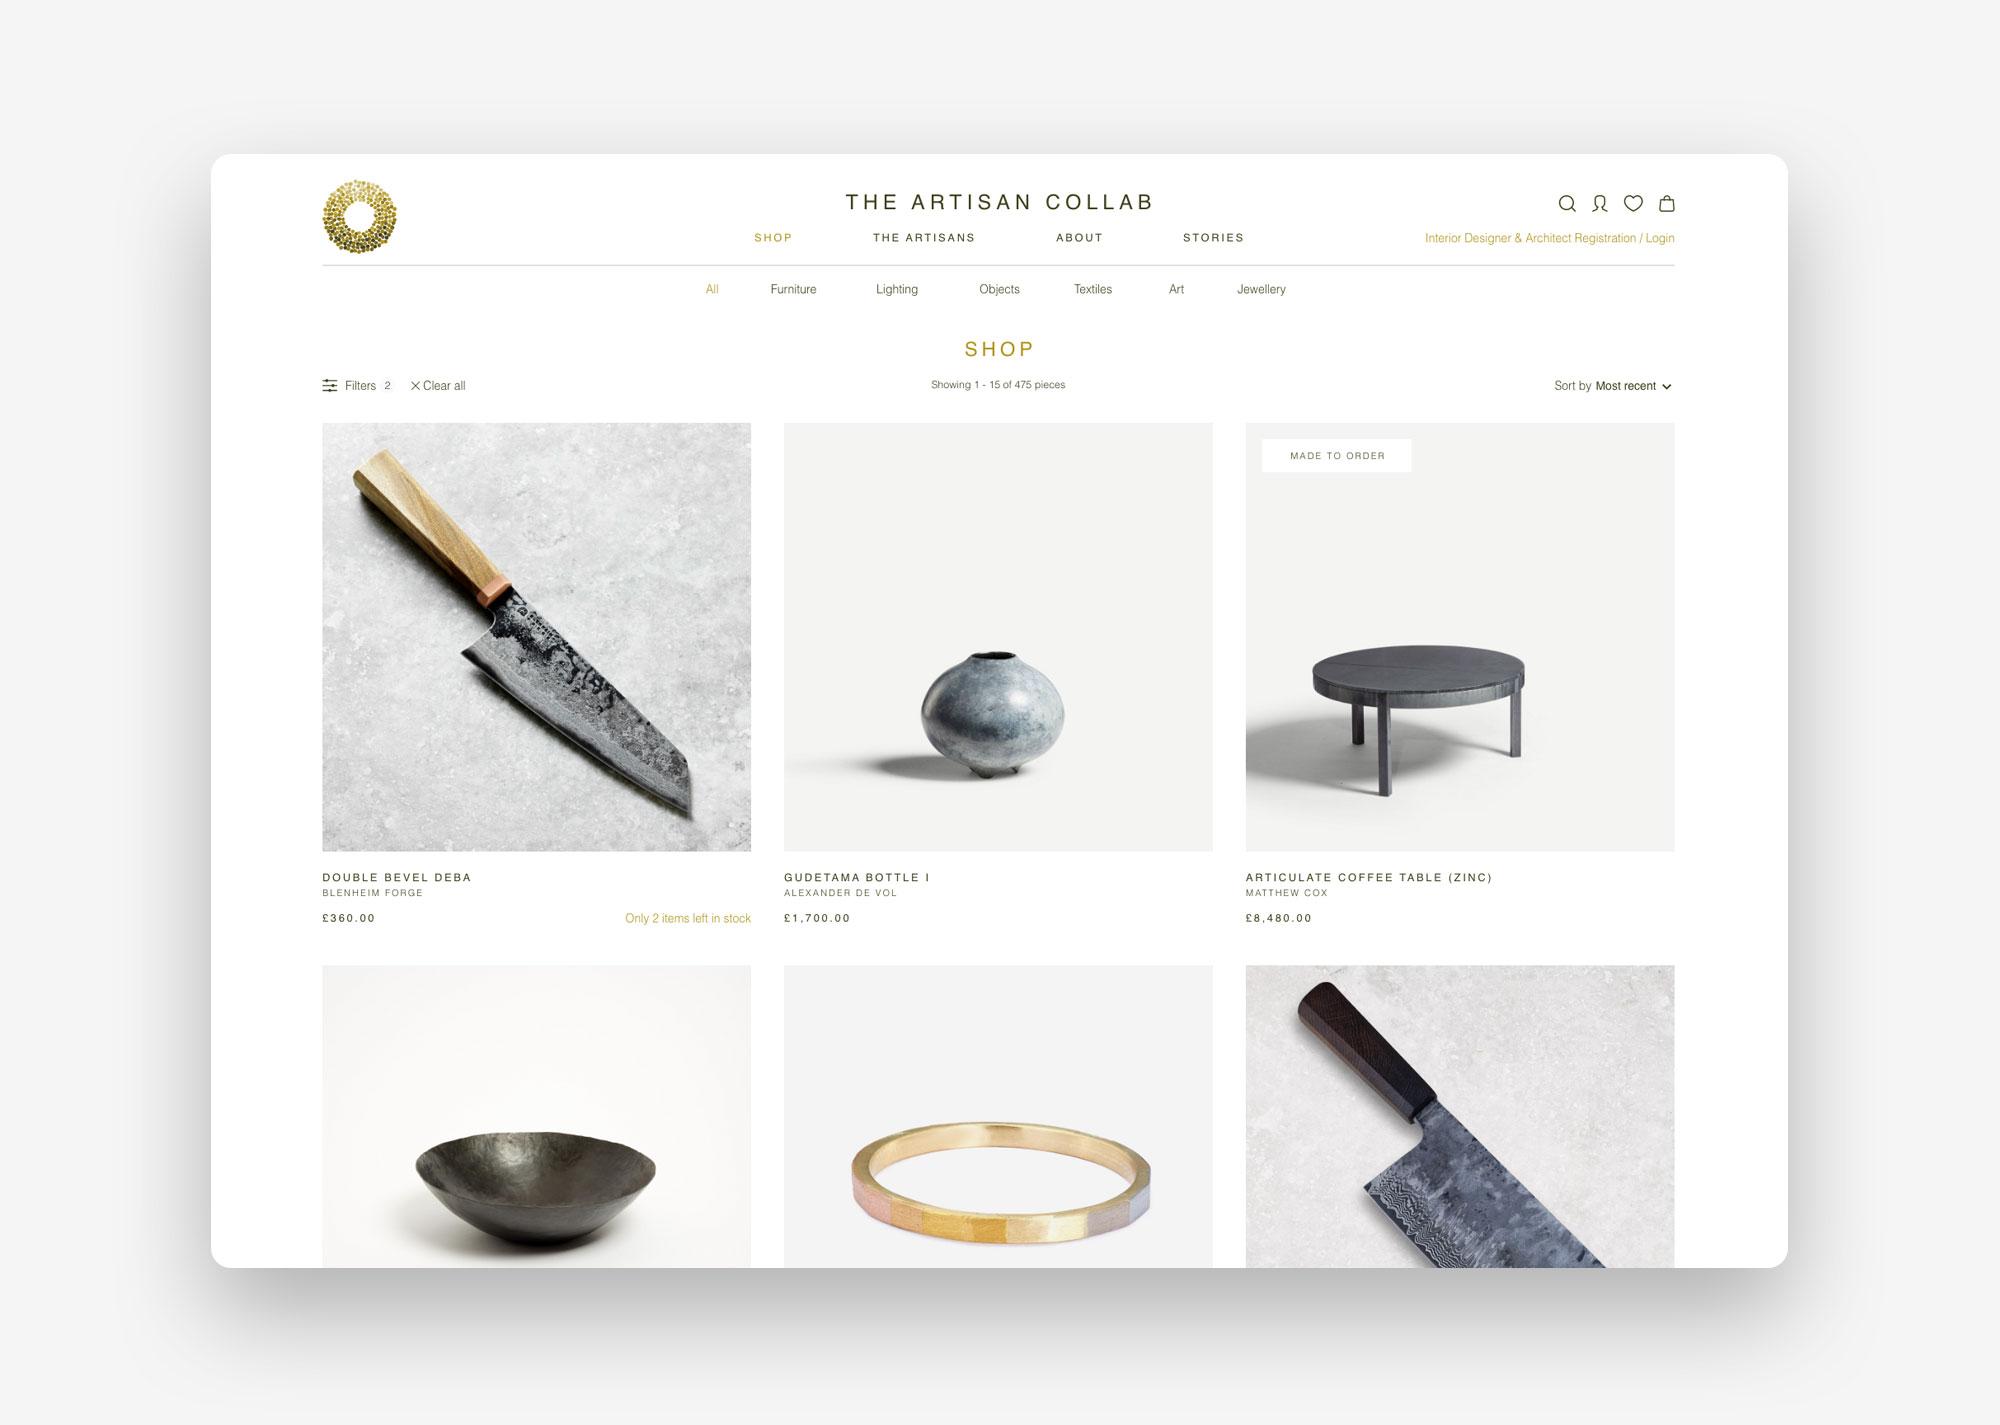 Artisan Collab UX shop page